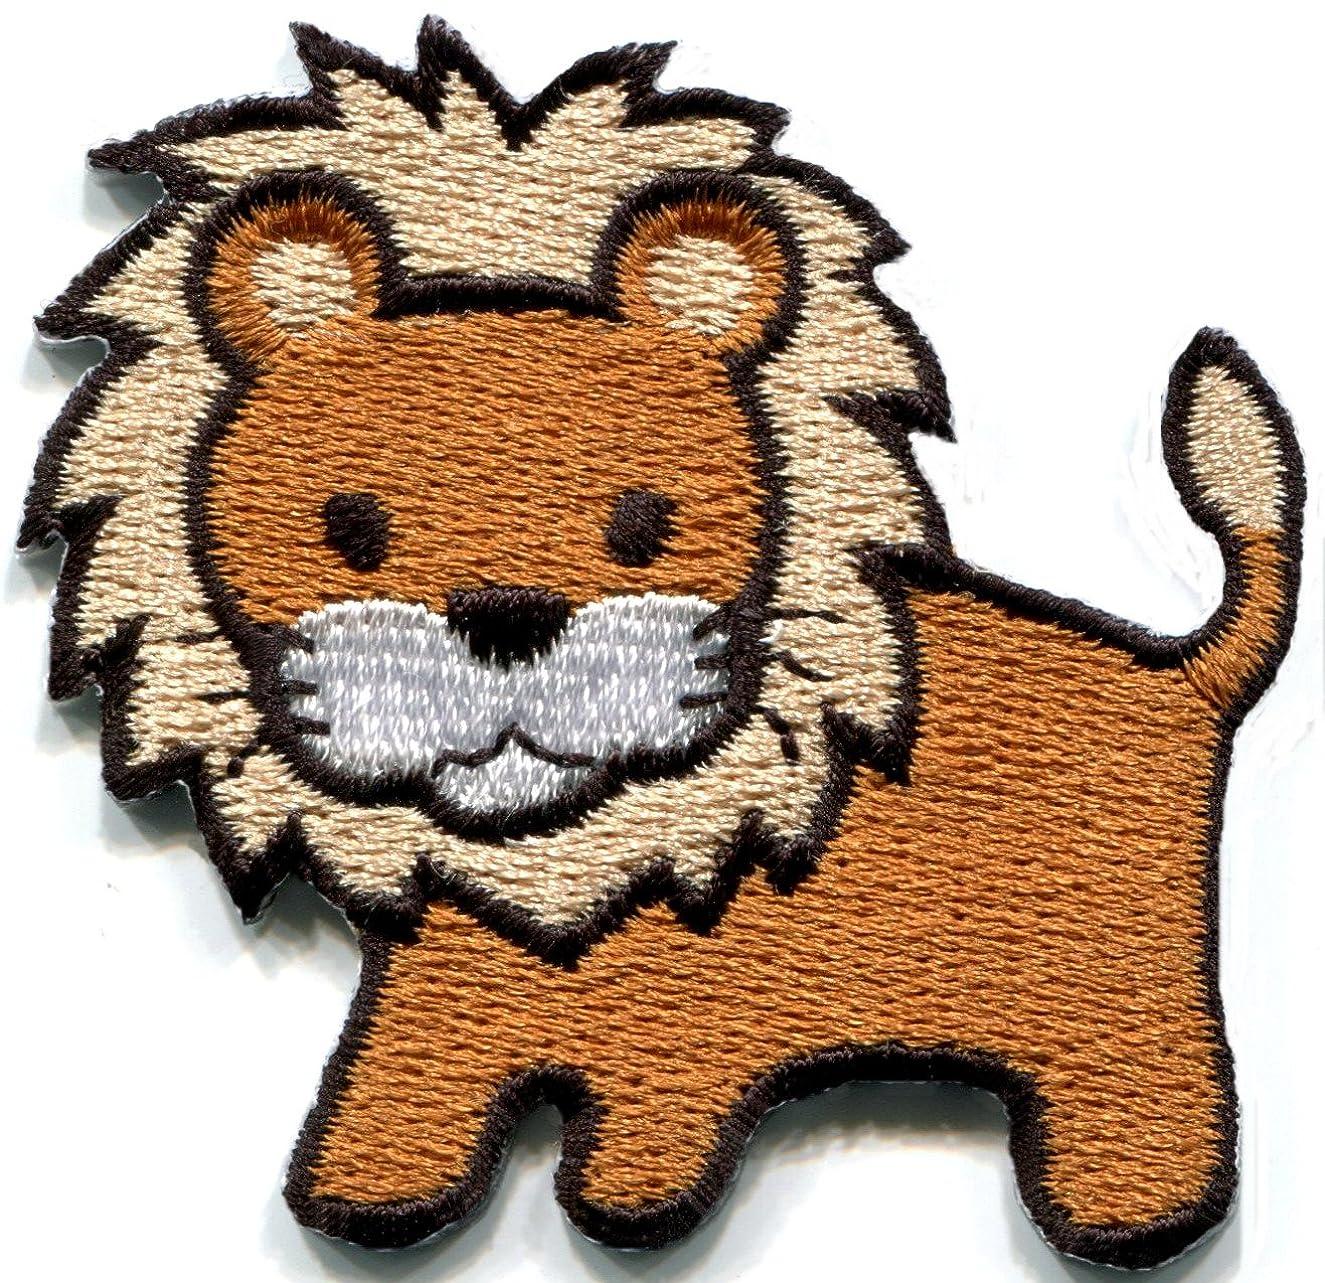 Lion cat puma jaguar tiger cheetah animal wildlife cute kids embroidered applique iron-on patch new